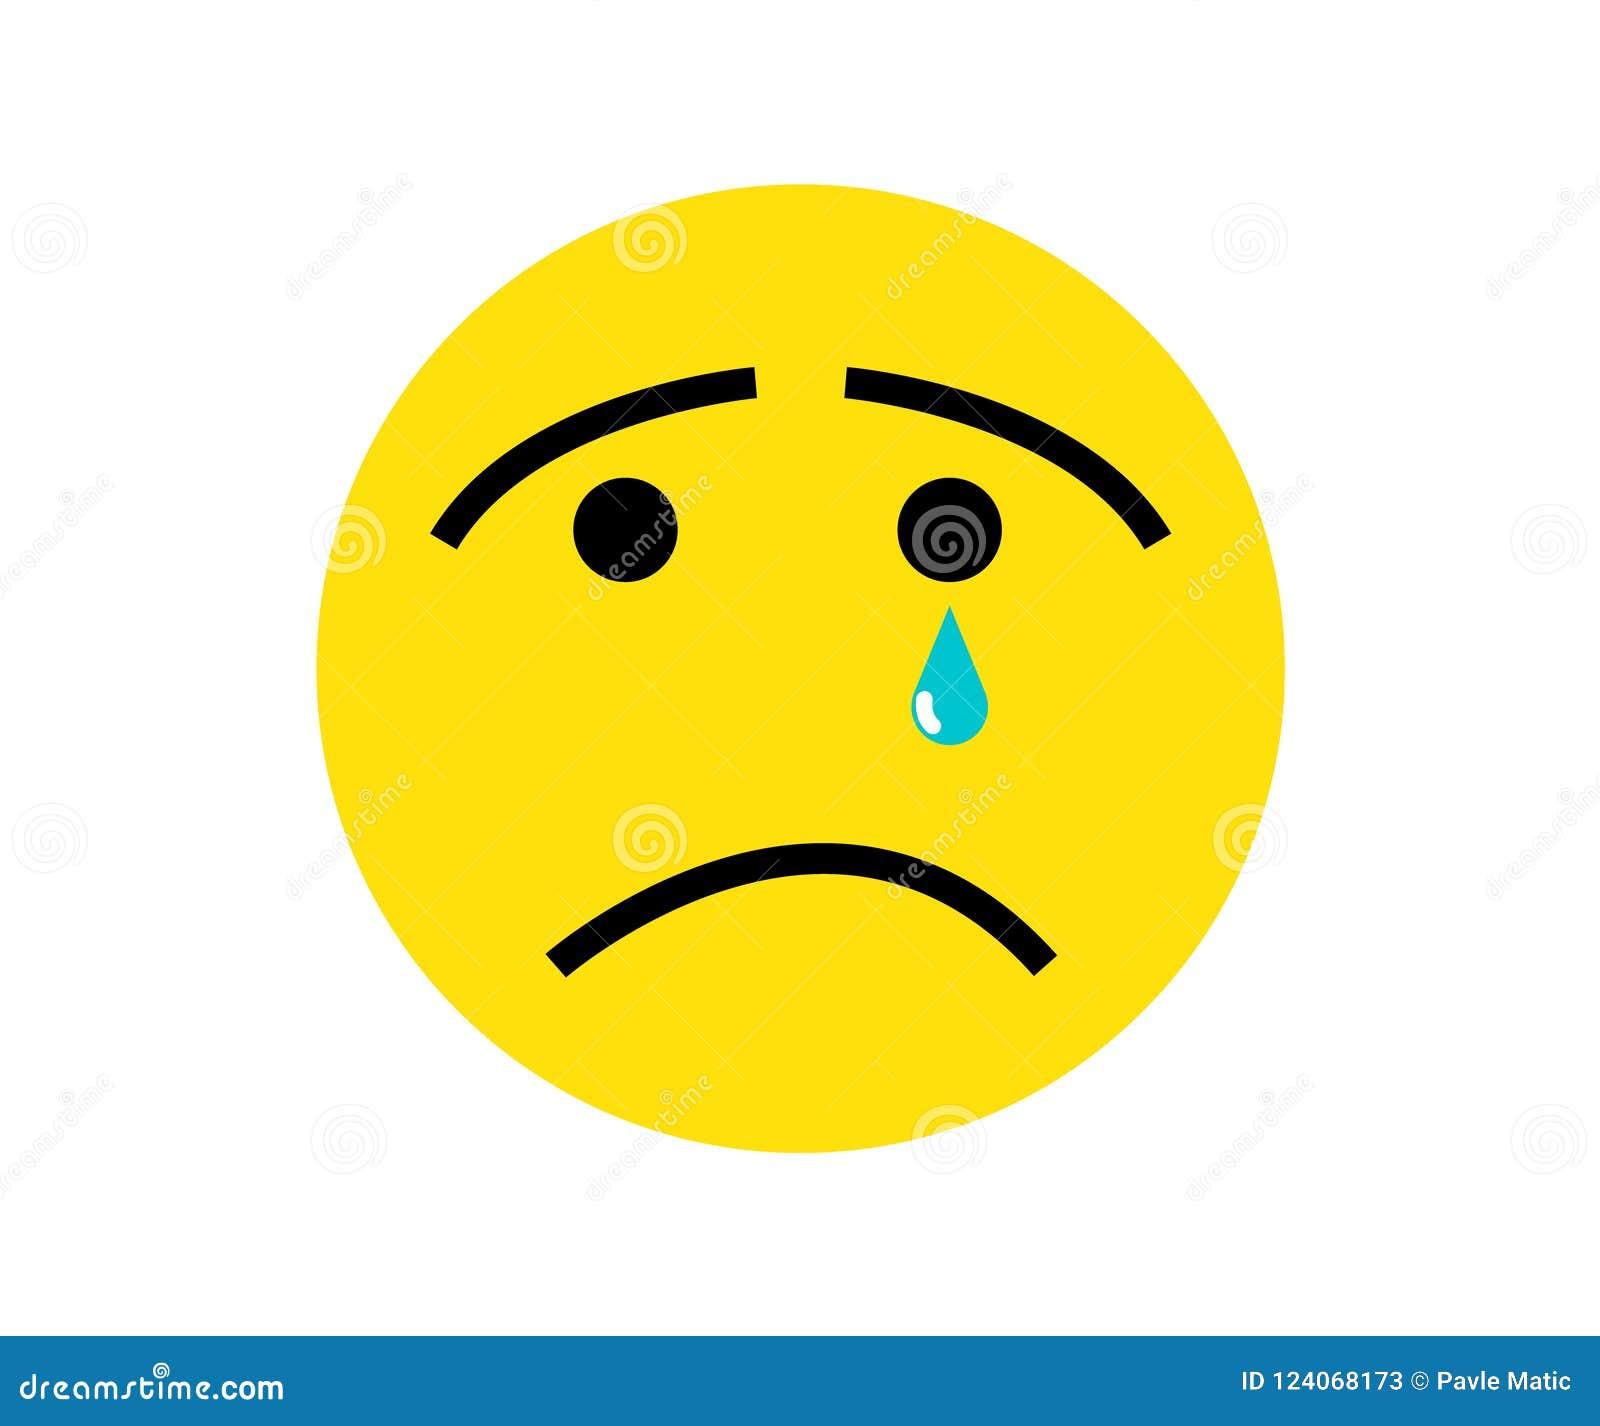 sad face emoticon stock vector illustration of design 124068173